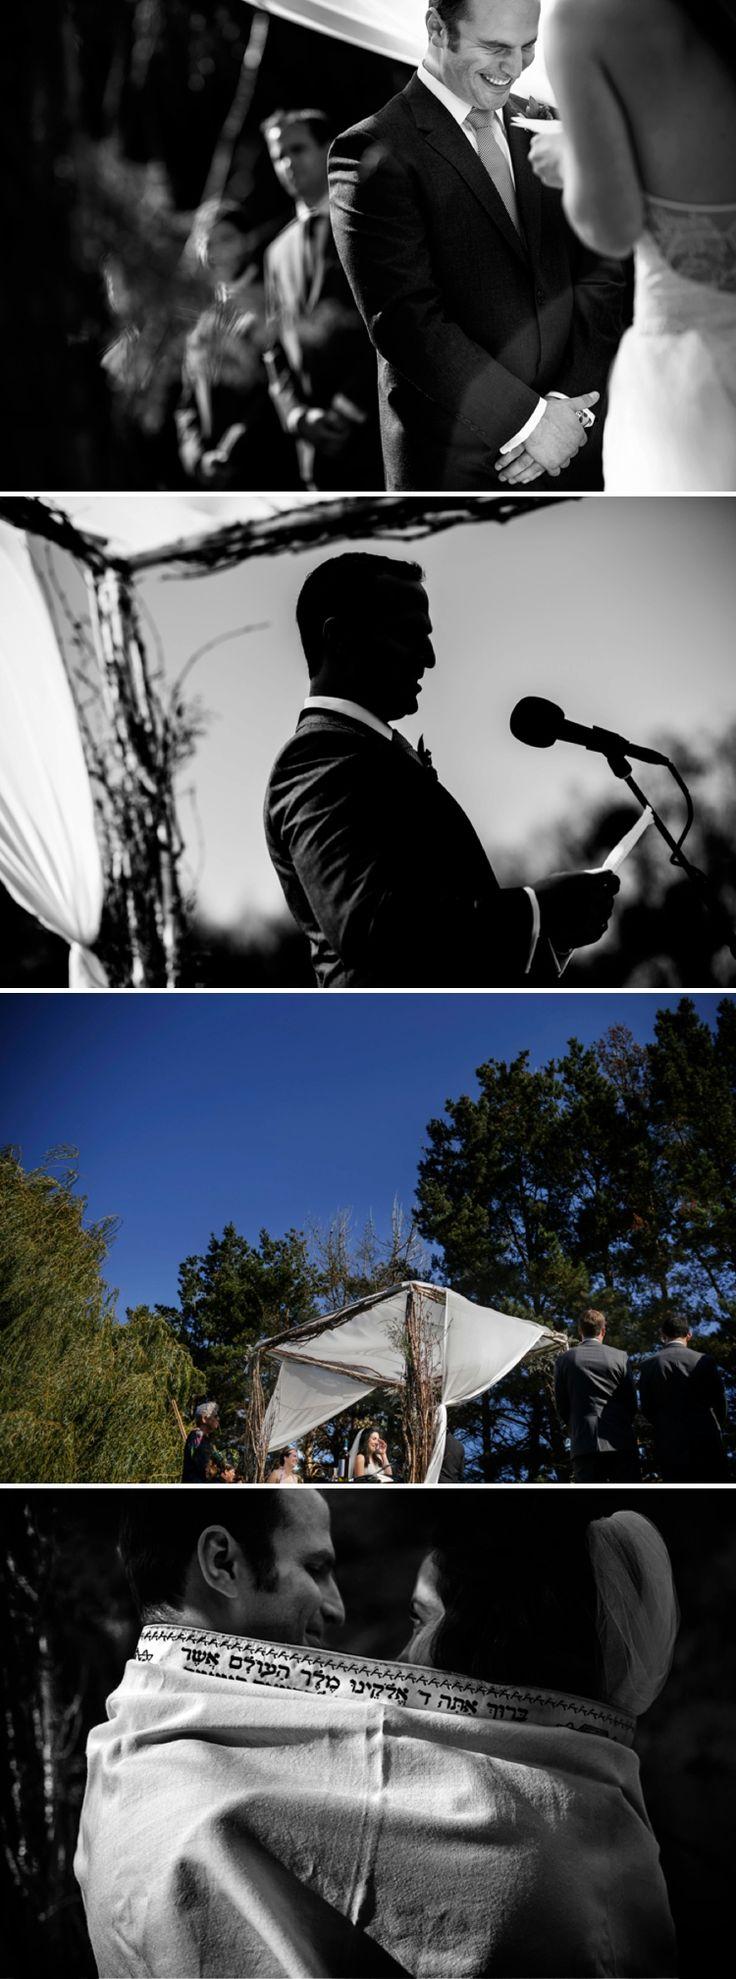 White rustic chuppah / a Vera Wang Bride / a Jewish travel-themed barn wedding / at Olympia's Valley Estate, Petaluma, California, USA / Photography by Chrisman Studios / http://www.smashingtheglass.com/2016/08/02/vera-wang-bride-jewish-travel-themed-barn-wedding-olympias-valley-estate-petaluma-california-usa/